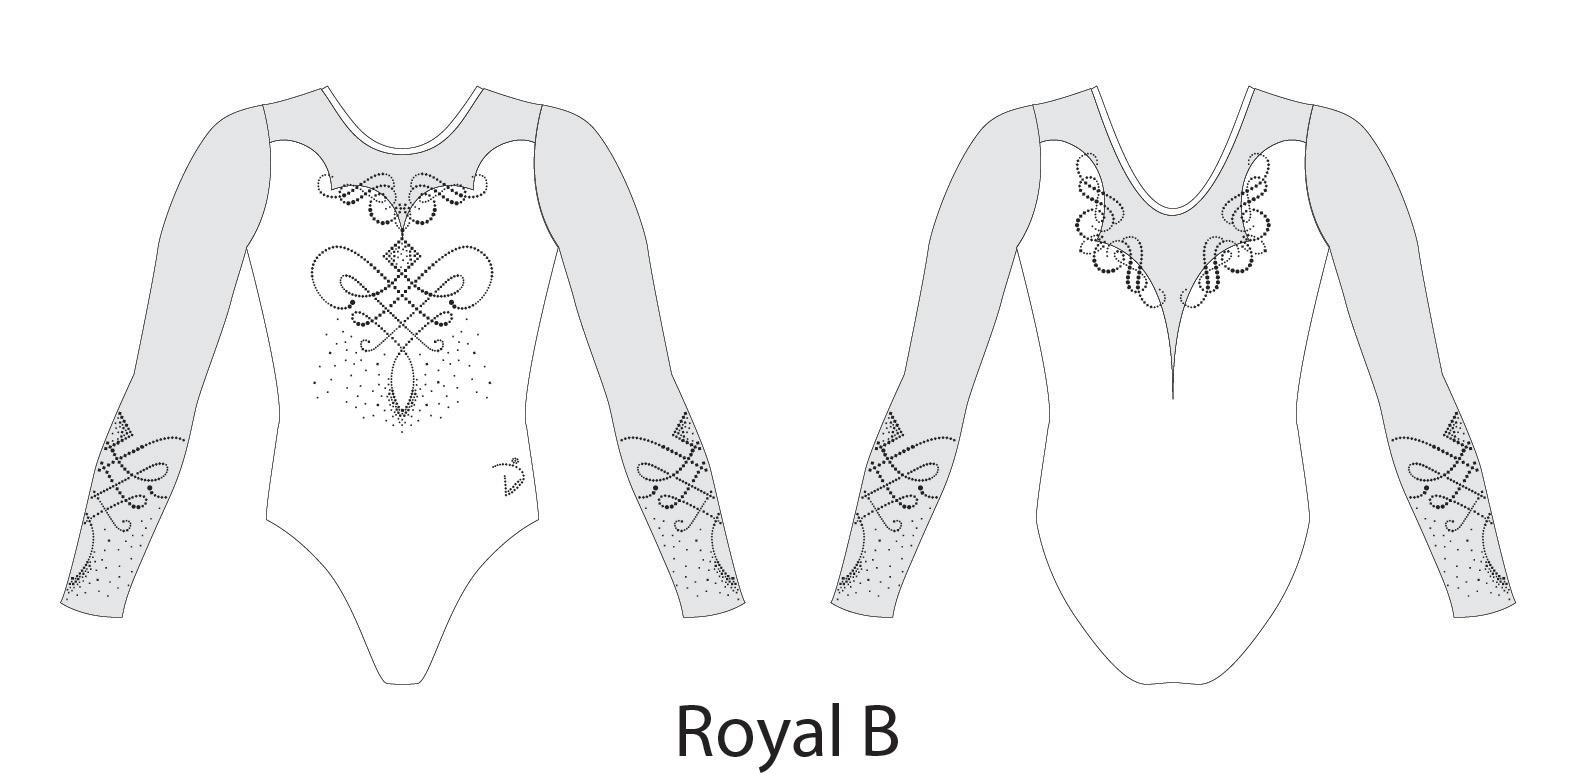 Royal B